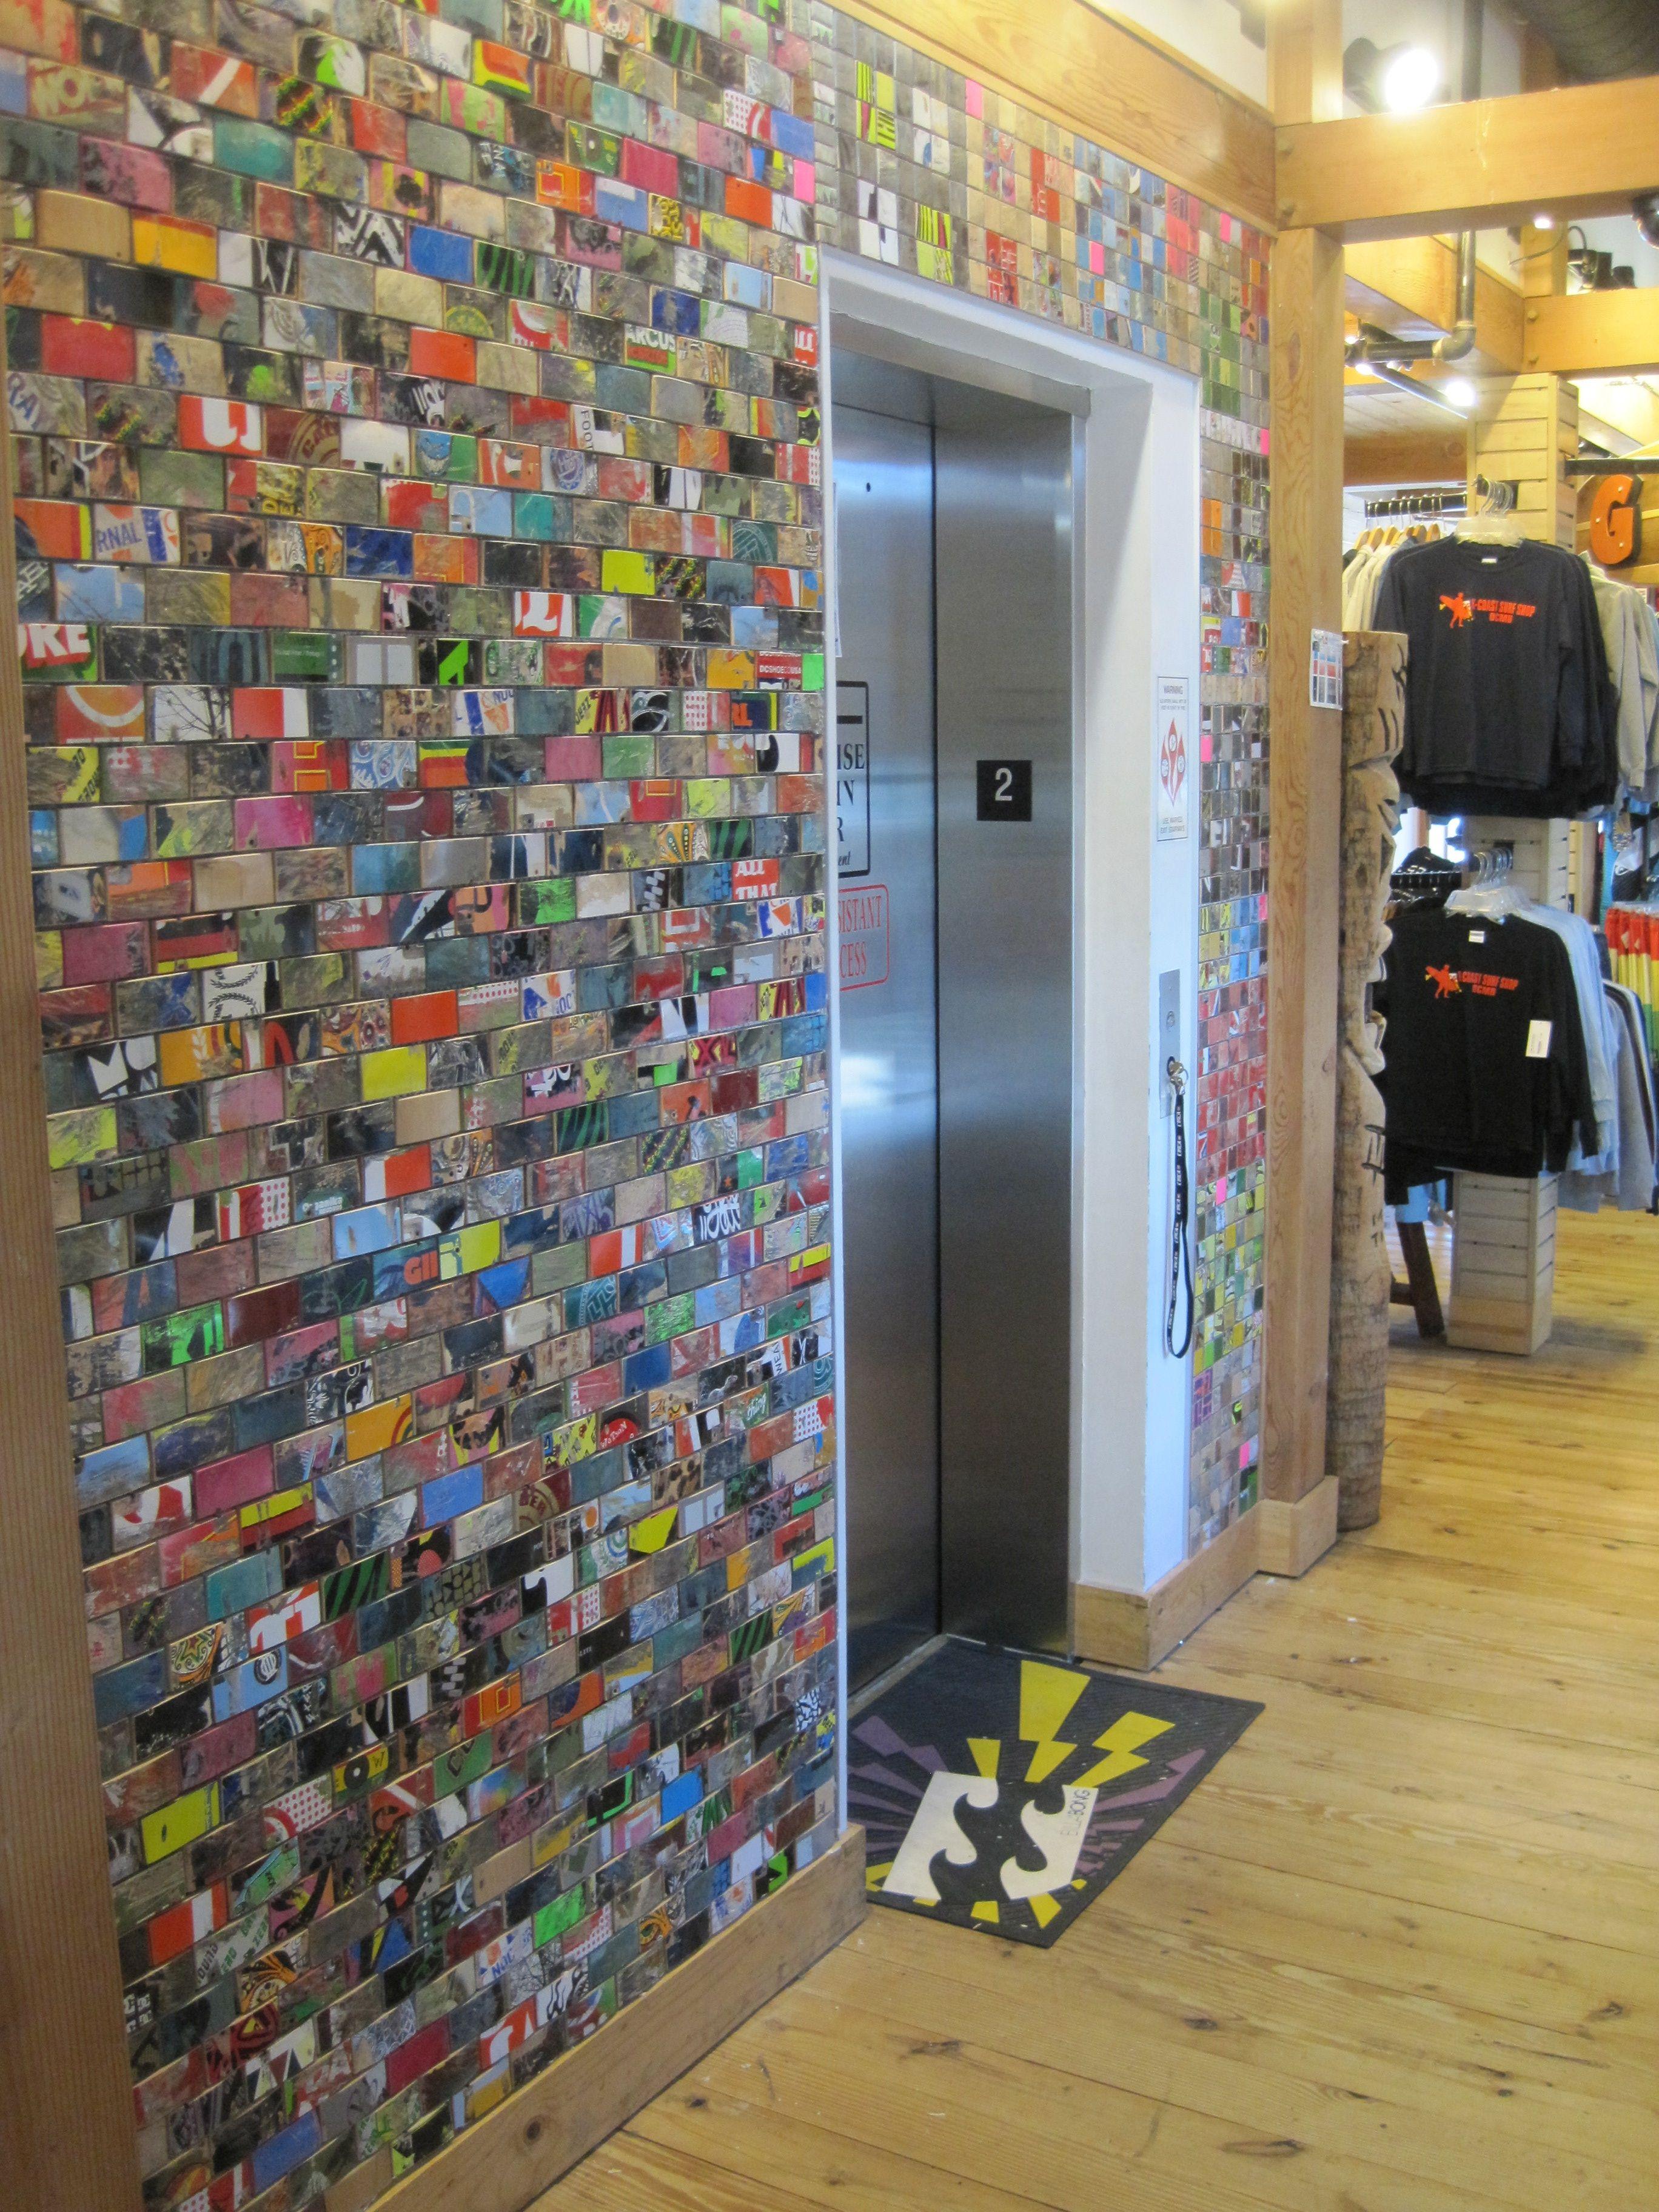 Upcycled Wall Art Art Of Board Wall Surface Inside K Coast Surf Shop Ocean City Md